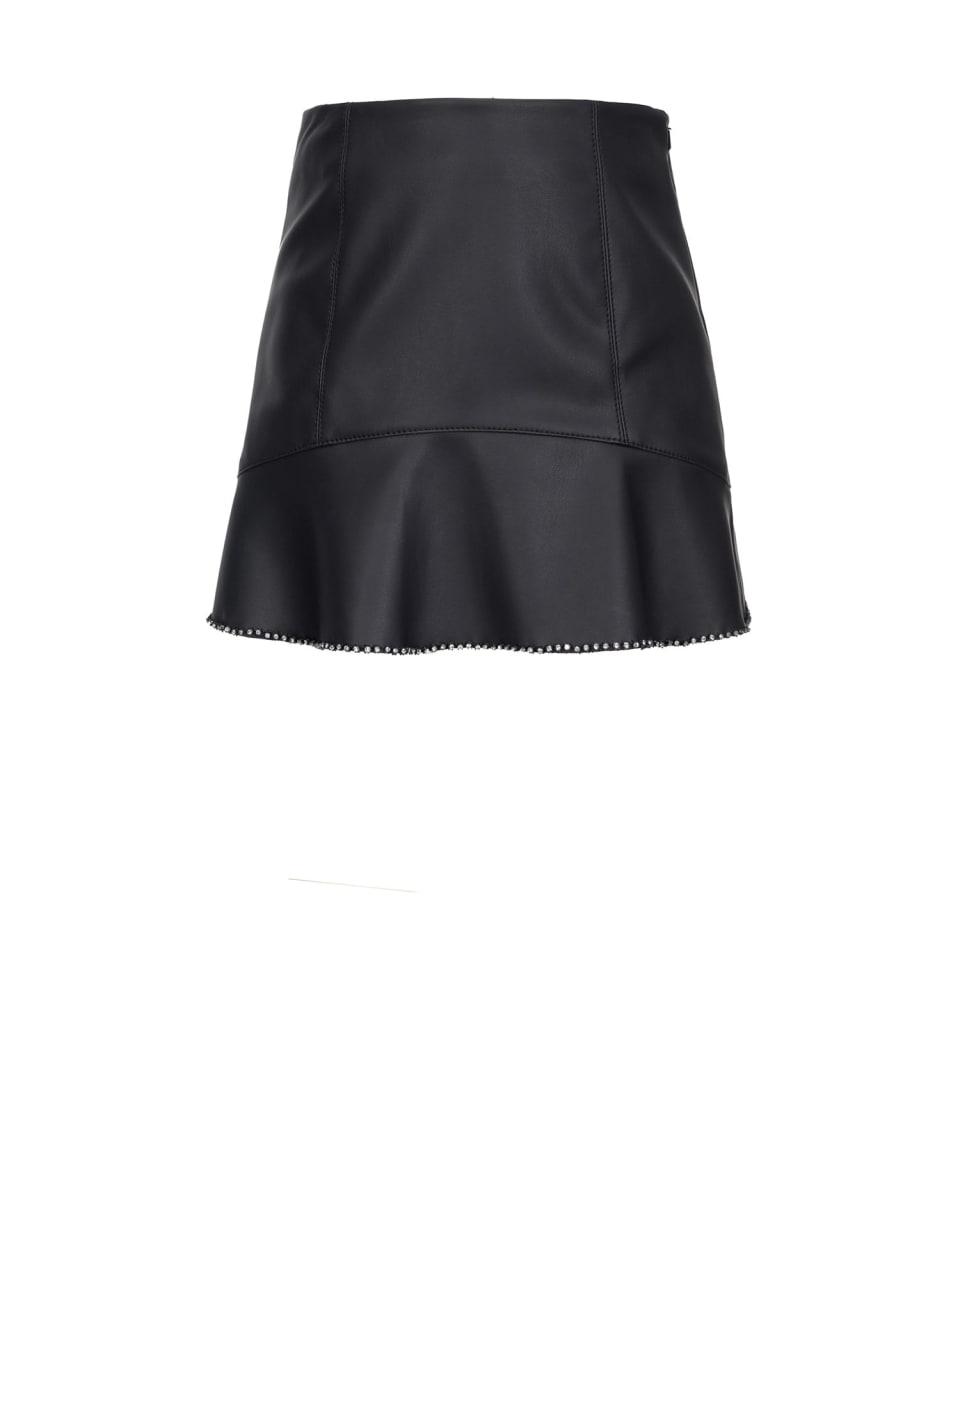 Leather-look skirt with rhinestones